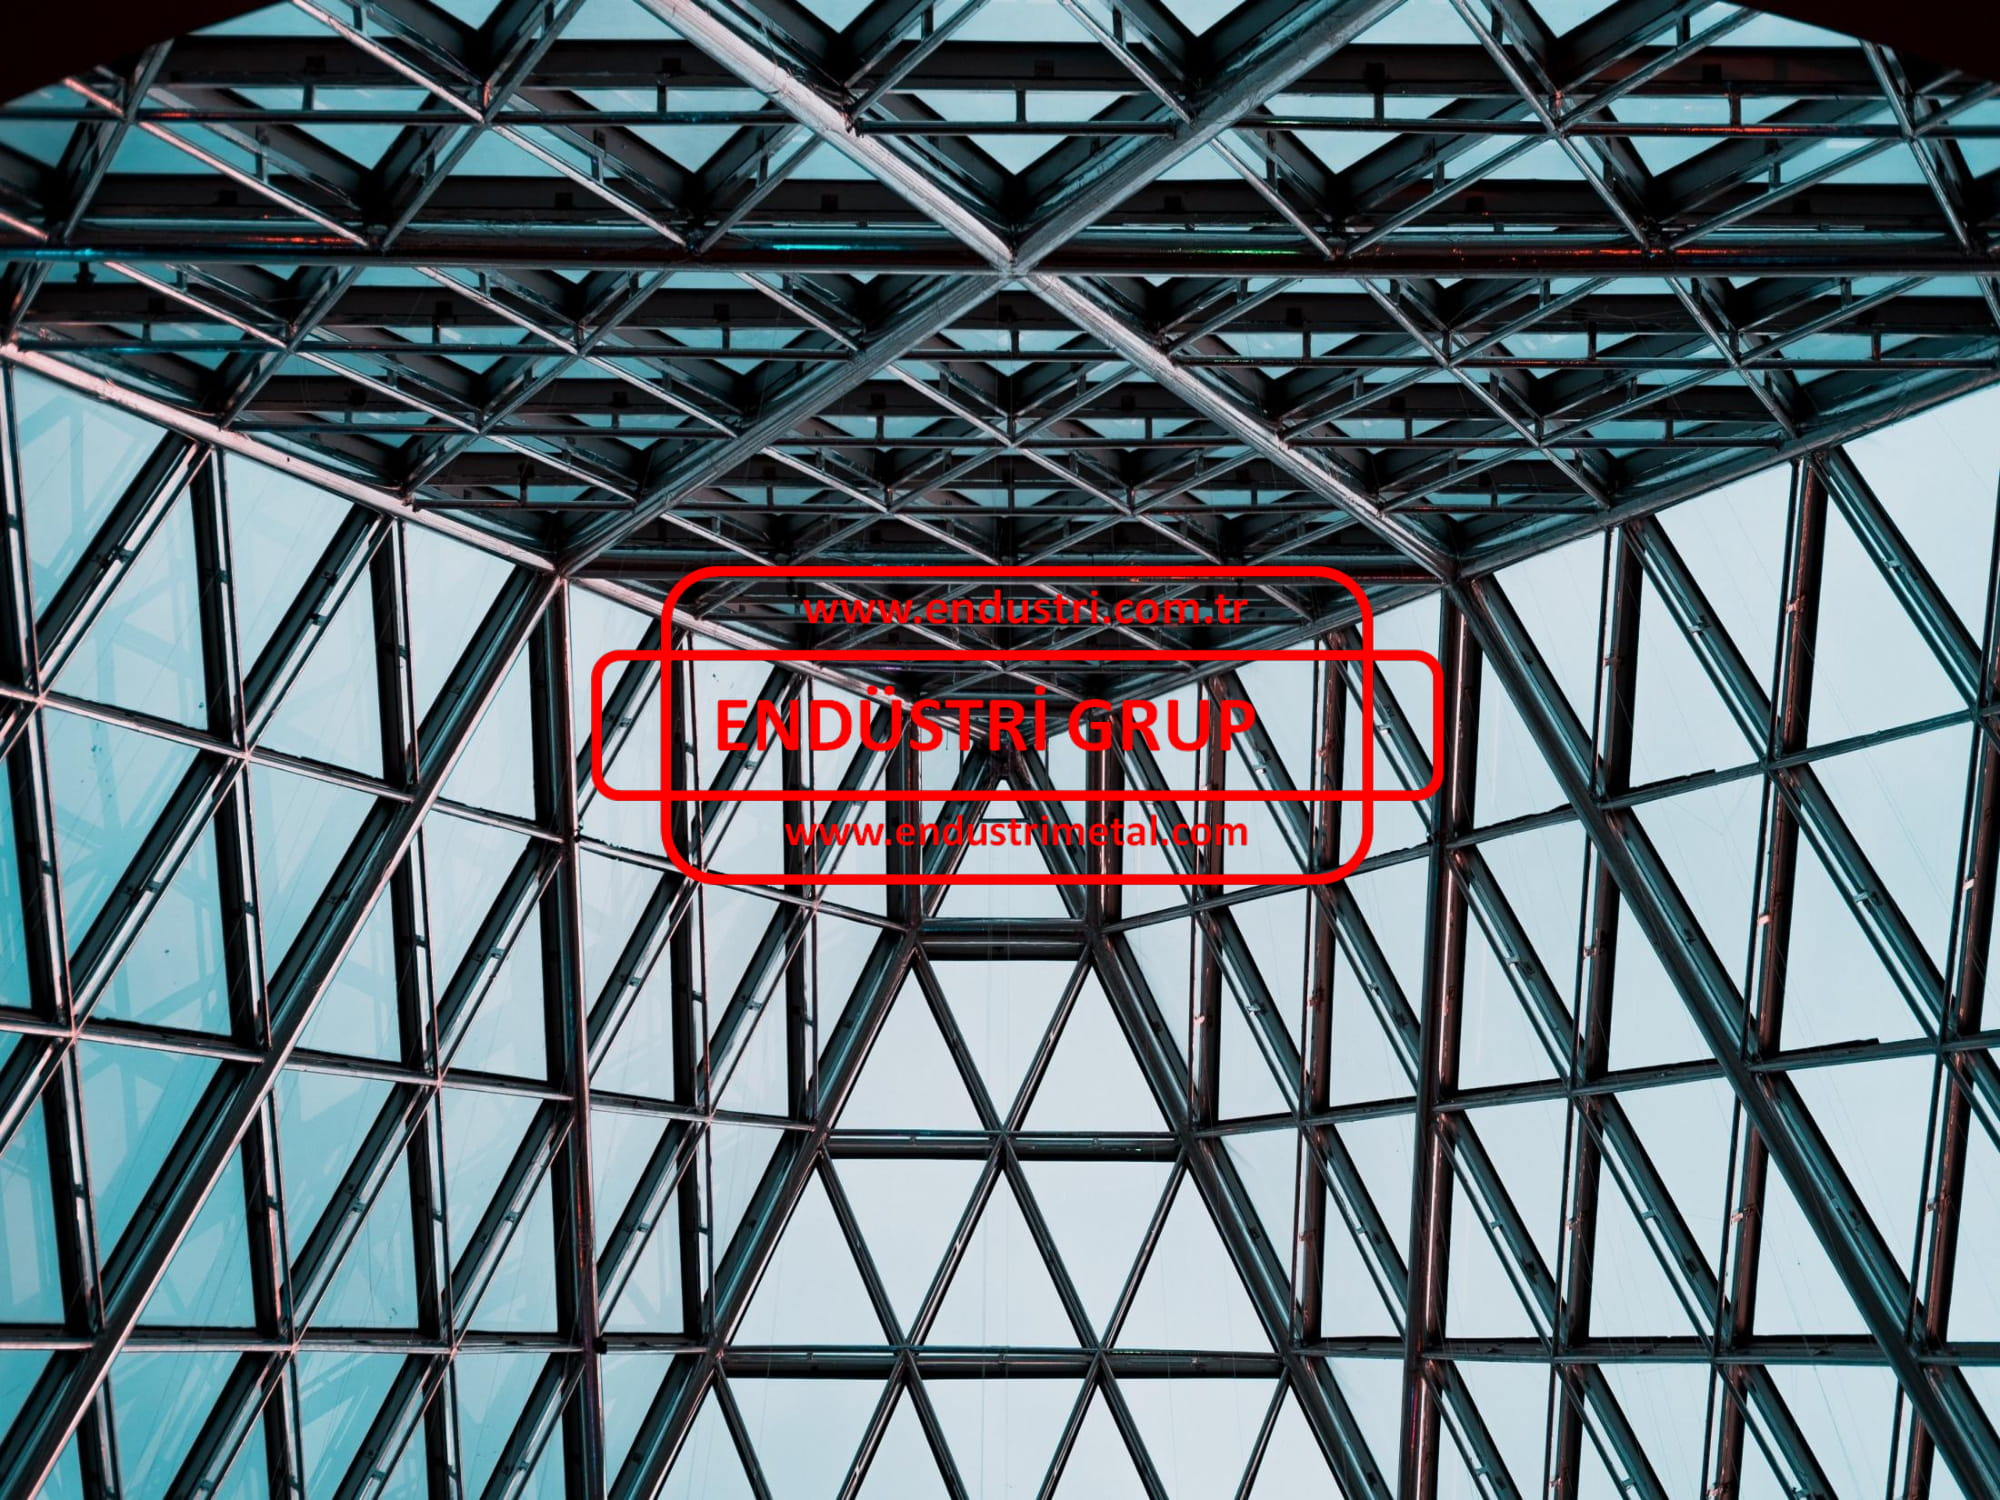 celik-insaat-konstruksiyon-yapilar-fabrikalar-binalar-catilar-evler-villalar-fiyatlari